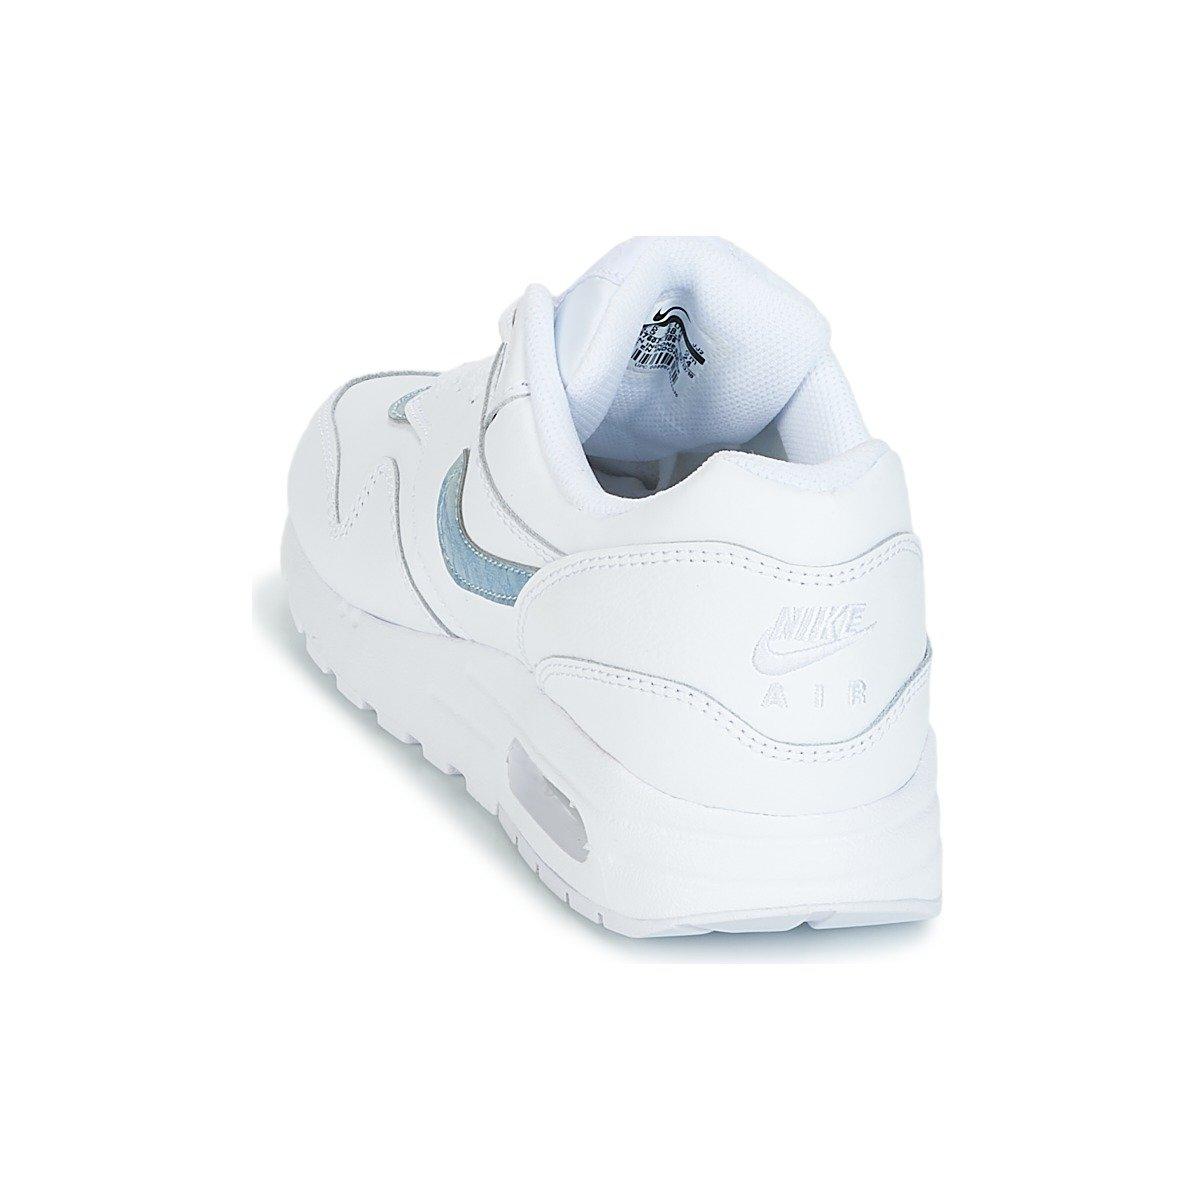 promo code 7d3ed f0d8b Amazon.com   Nike Air Max 1 (gs) Big Kids 807602-106   Running